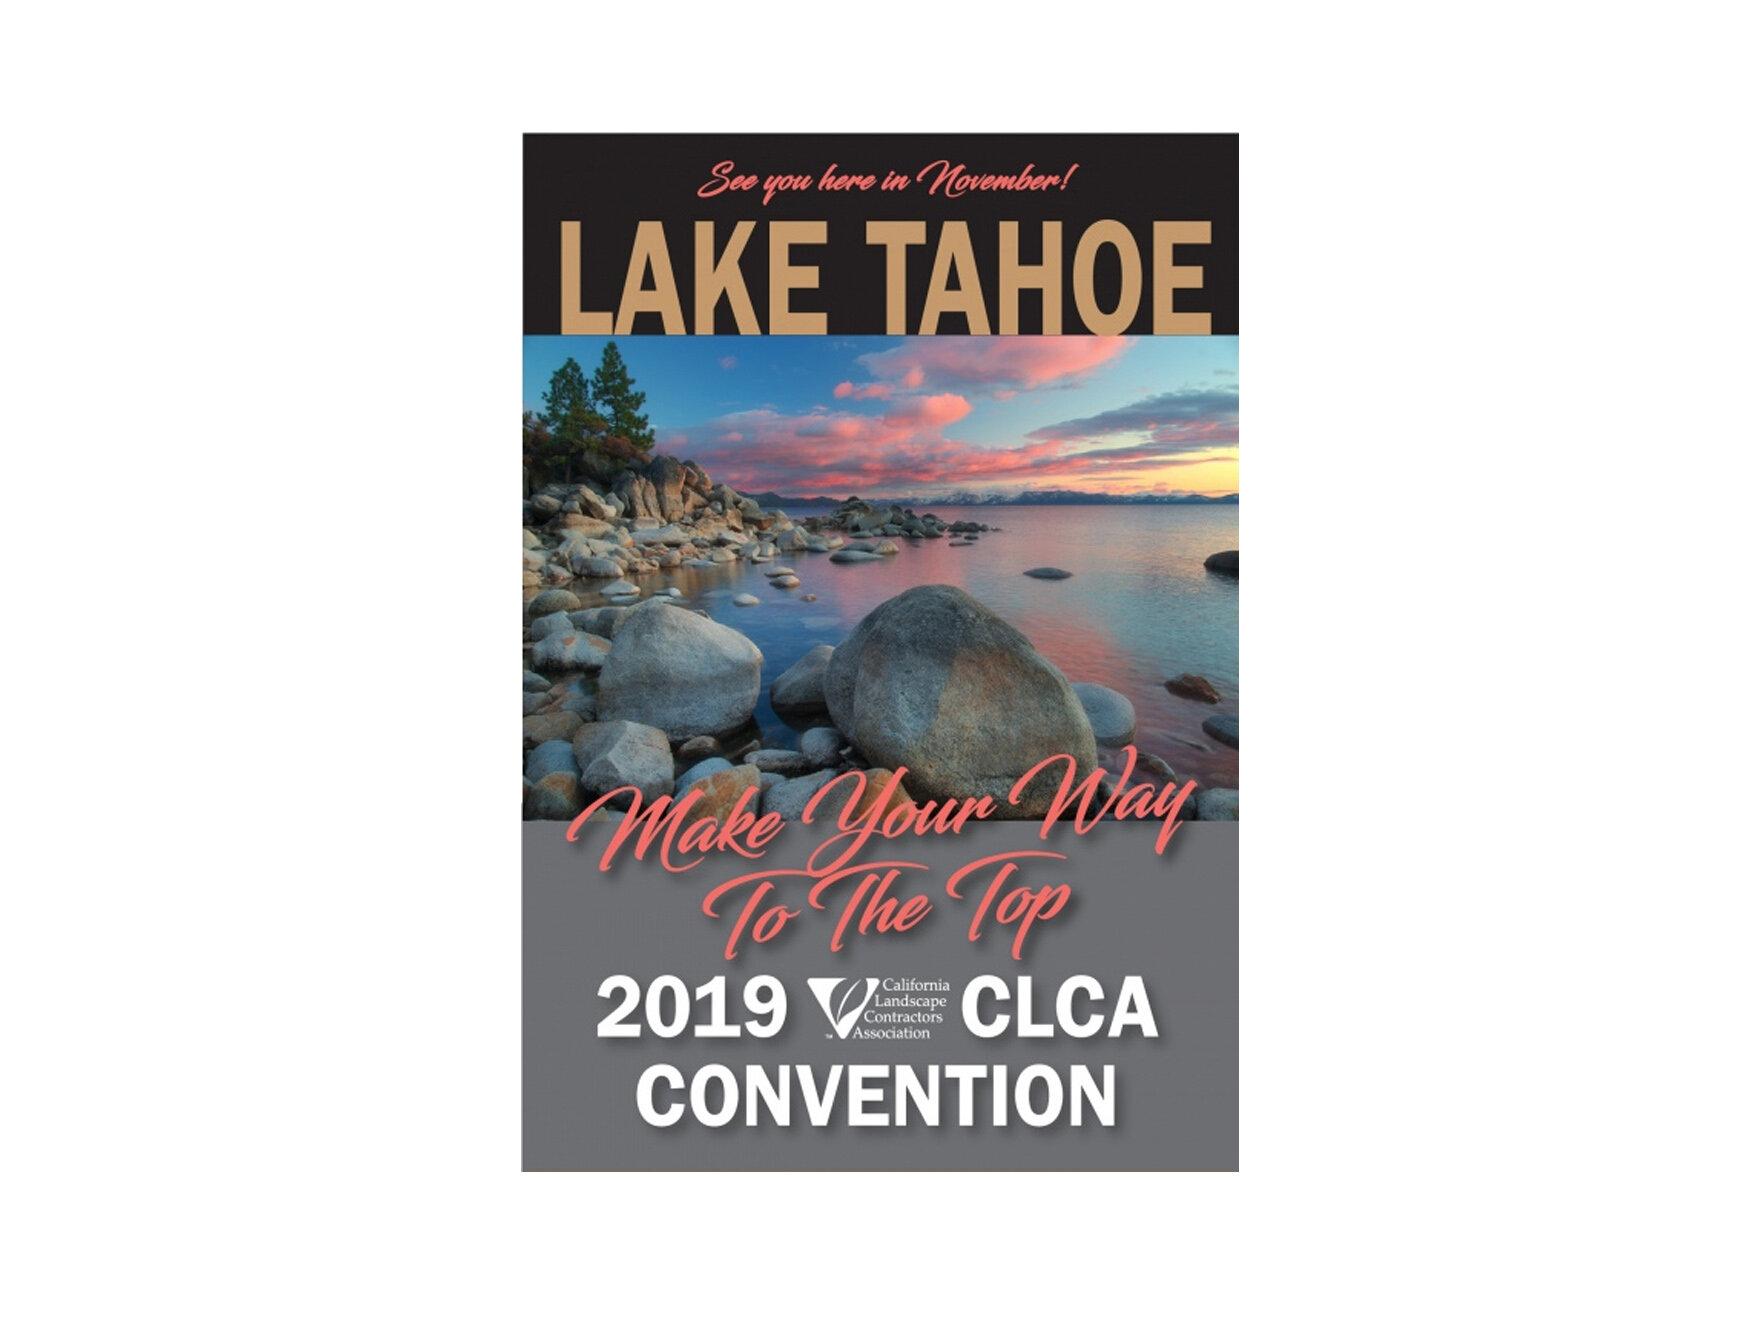 CLCA Convention 2019_AD.jpg